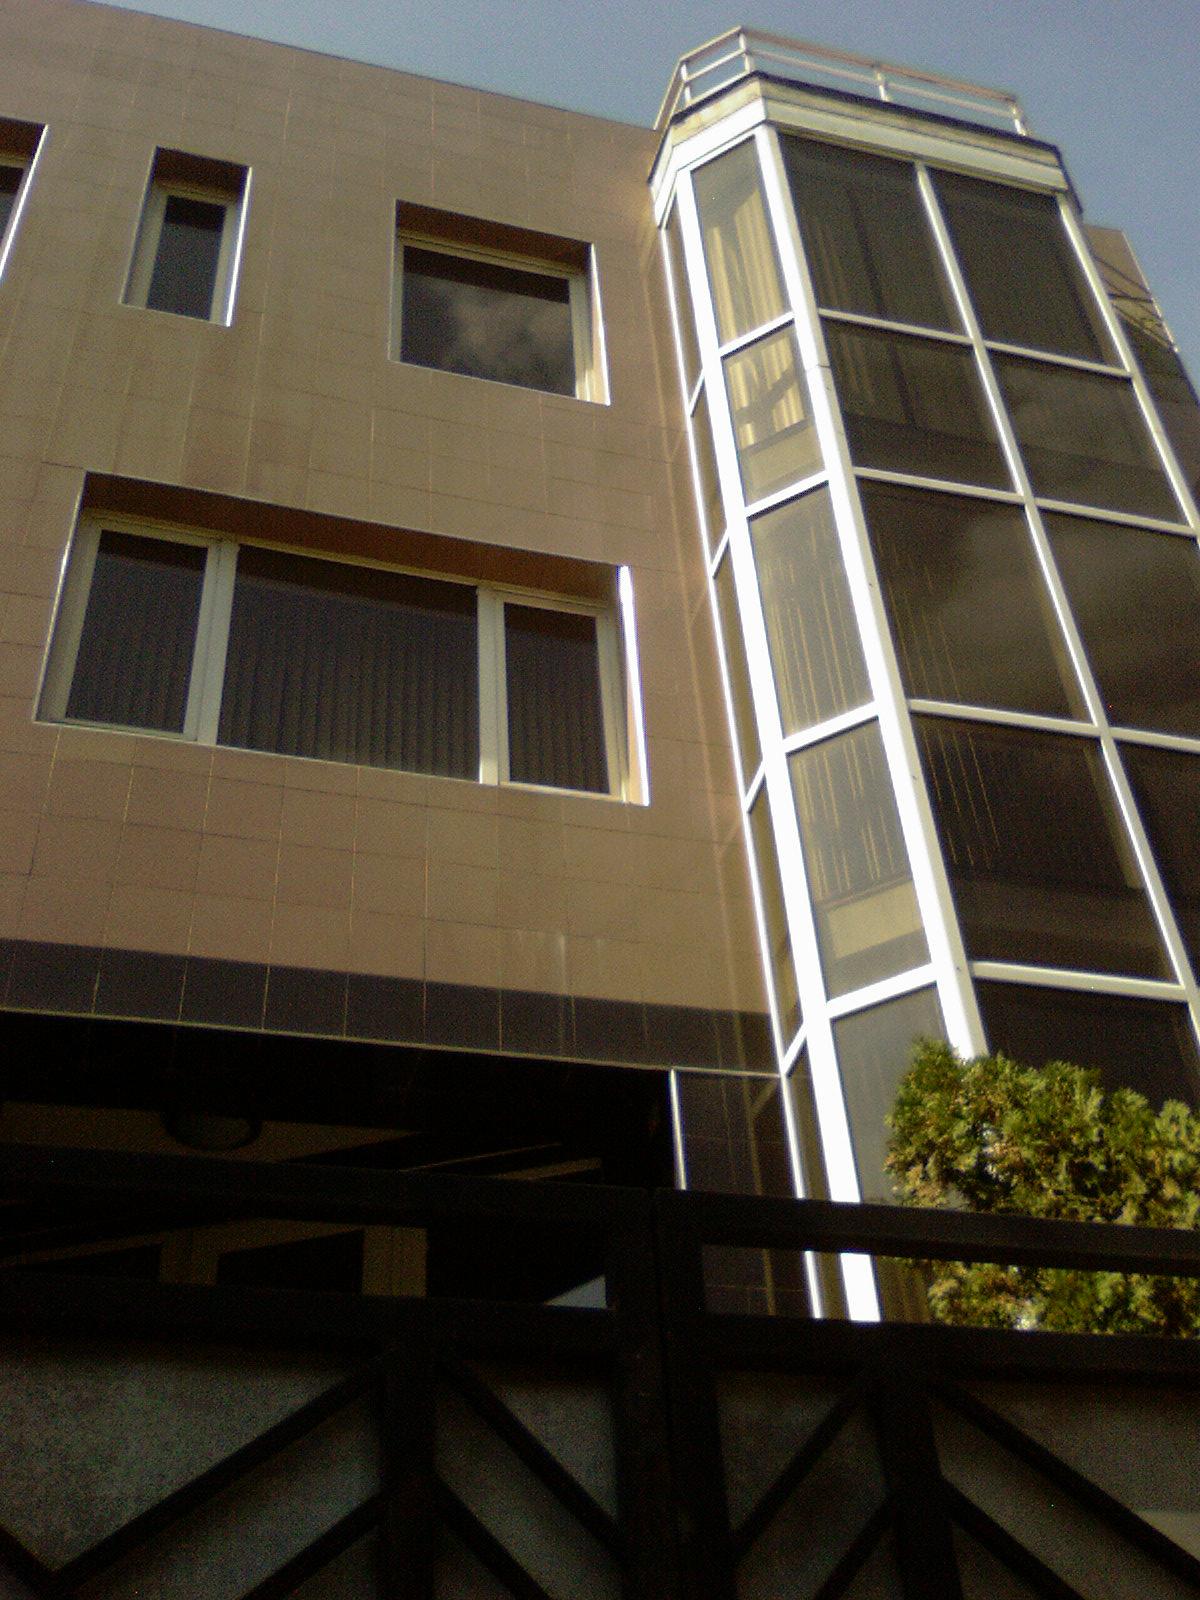 Vendita altro commerciale bucharest bucharest romania - Agenzie immobiliari bucarest ...